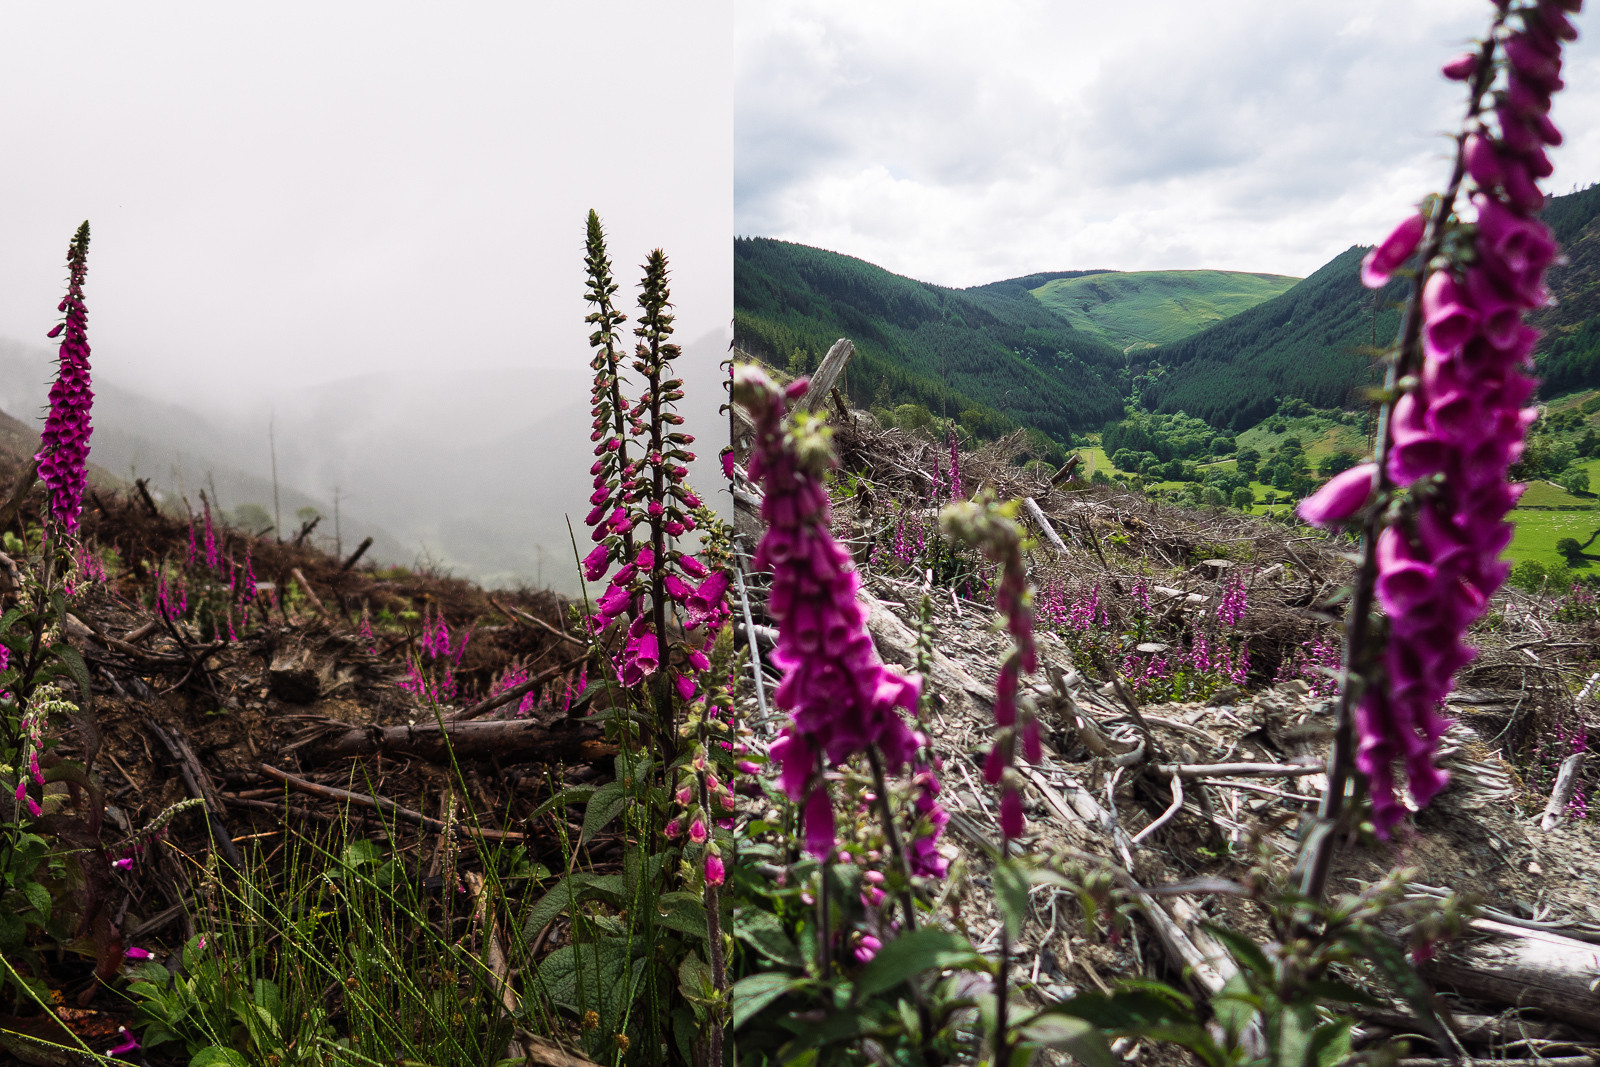 Tale of Two Views, British DH Series, Bala - RACE REPORT - 2015 British Downhill Series Bala - Mountain Biking Pictures - Vital MTB